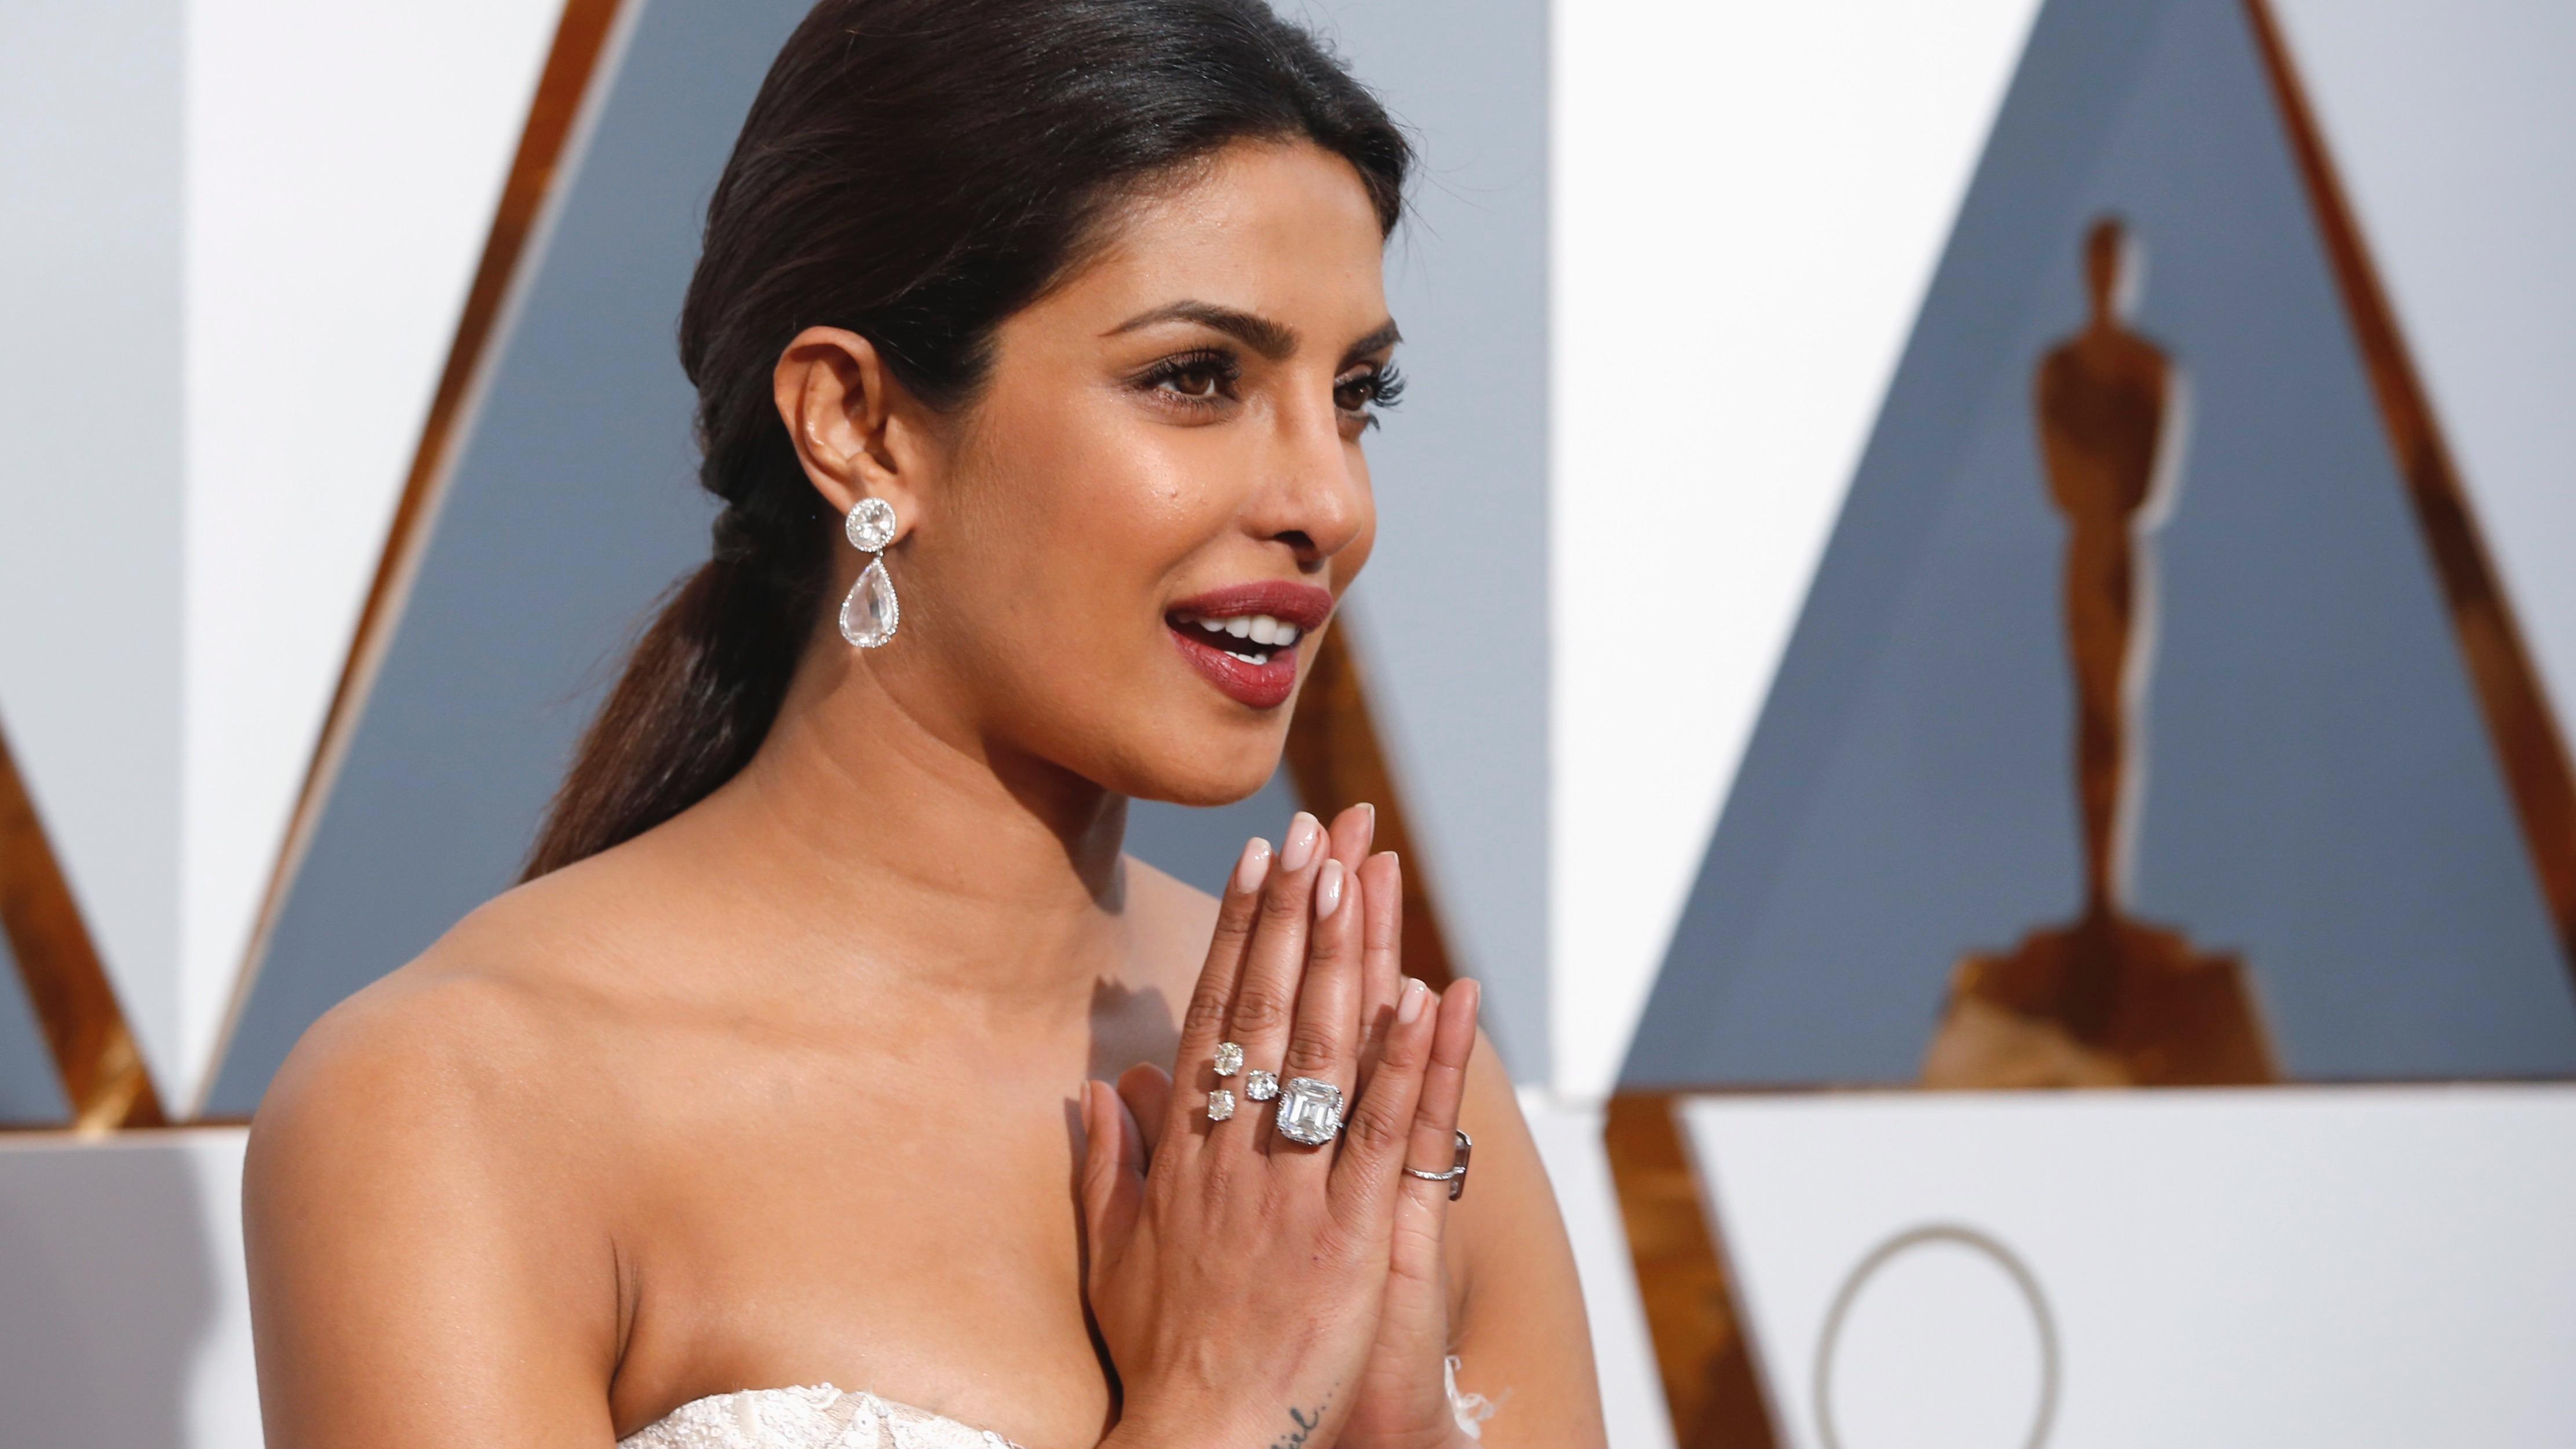 Presenter Priyanka Chopra arrives at the 88th Academy Awards in Hollywood, California February 28, 2016.  REUTERS/Adrees Latif - RTS8FM7